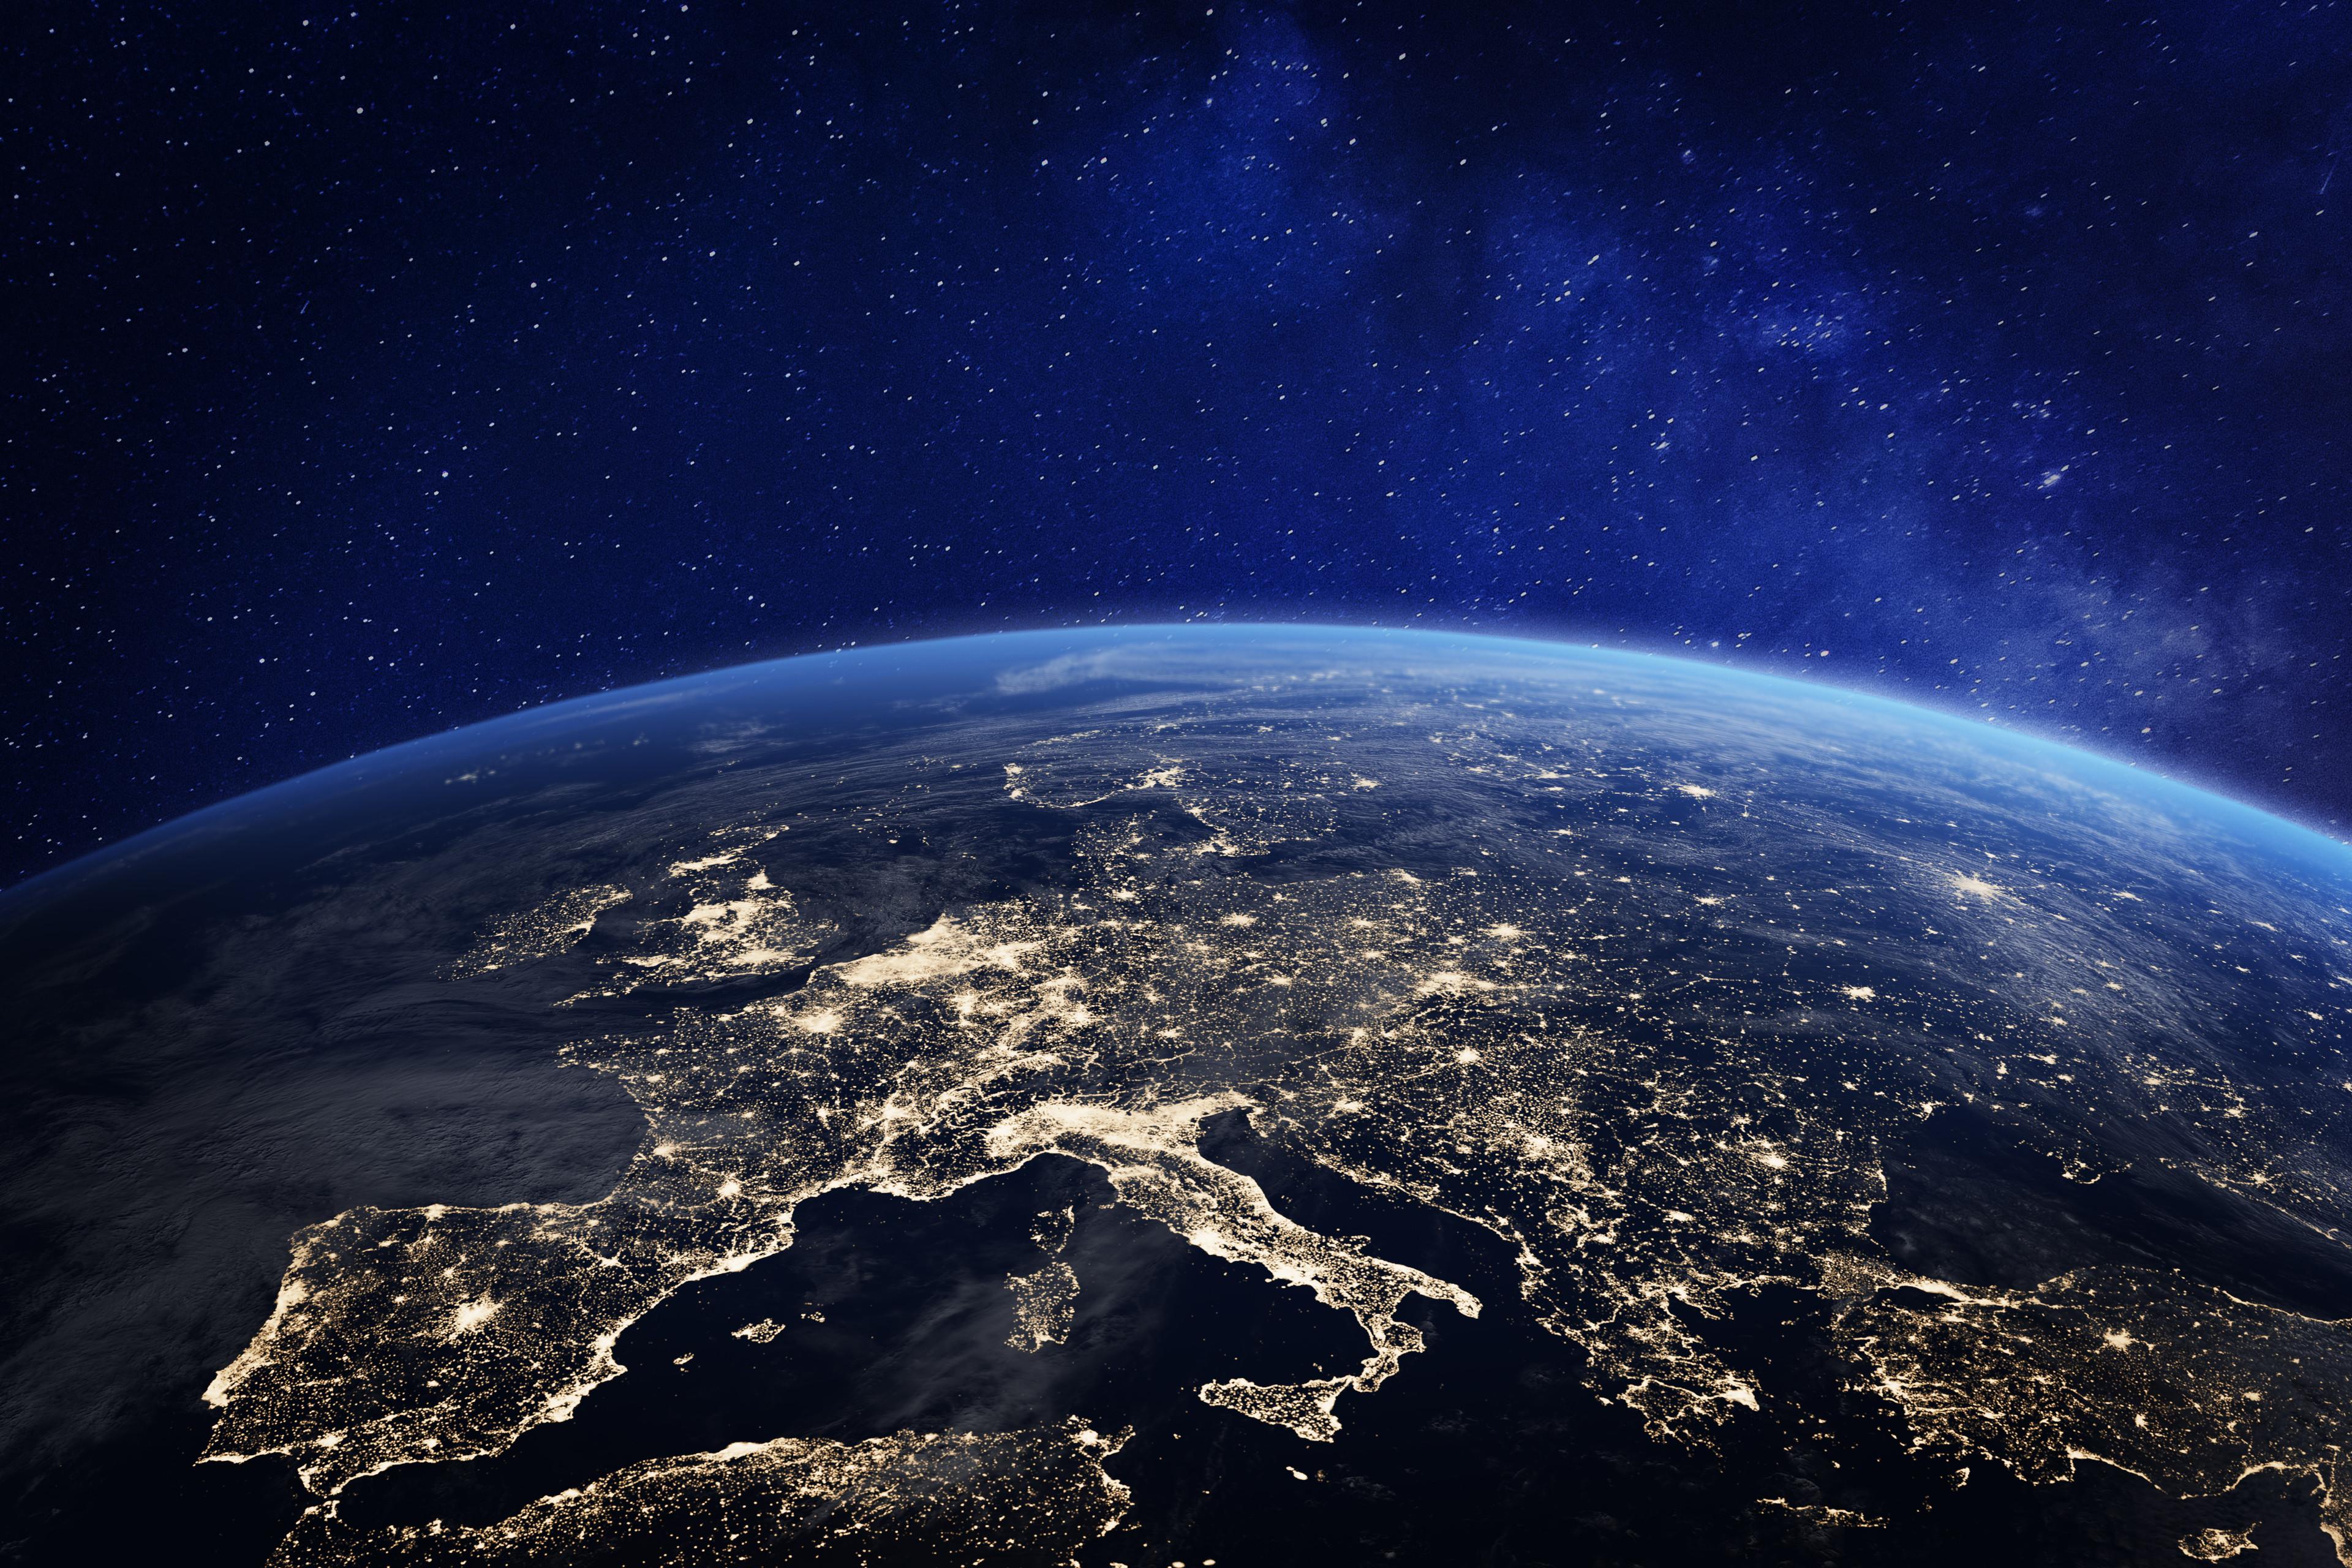 FMI promete agir rapidamente para impulsionar o crescimento global